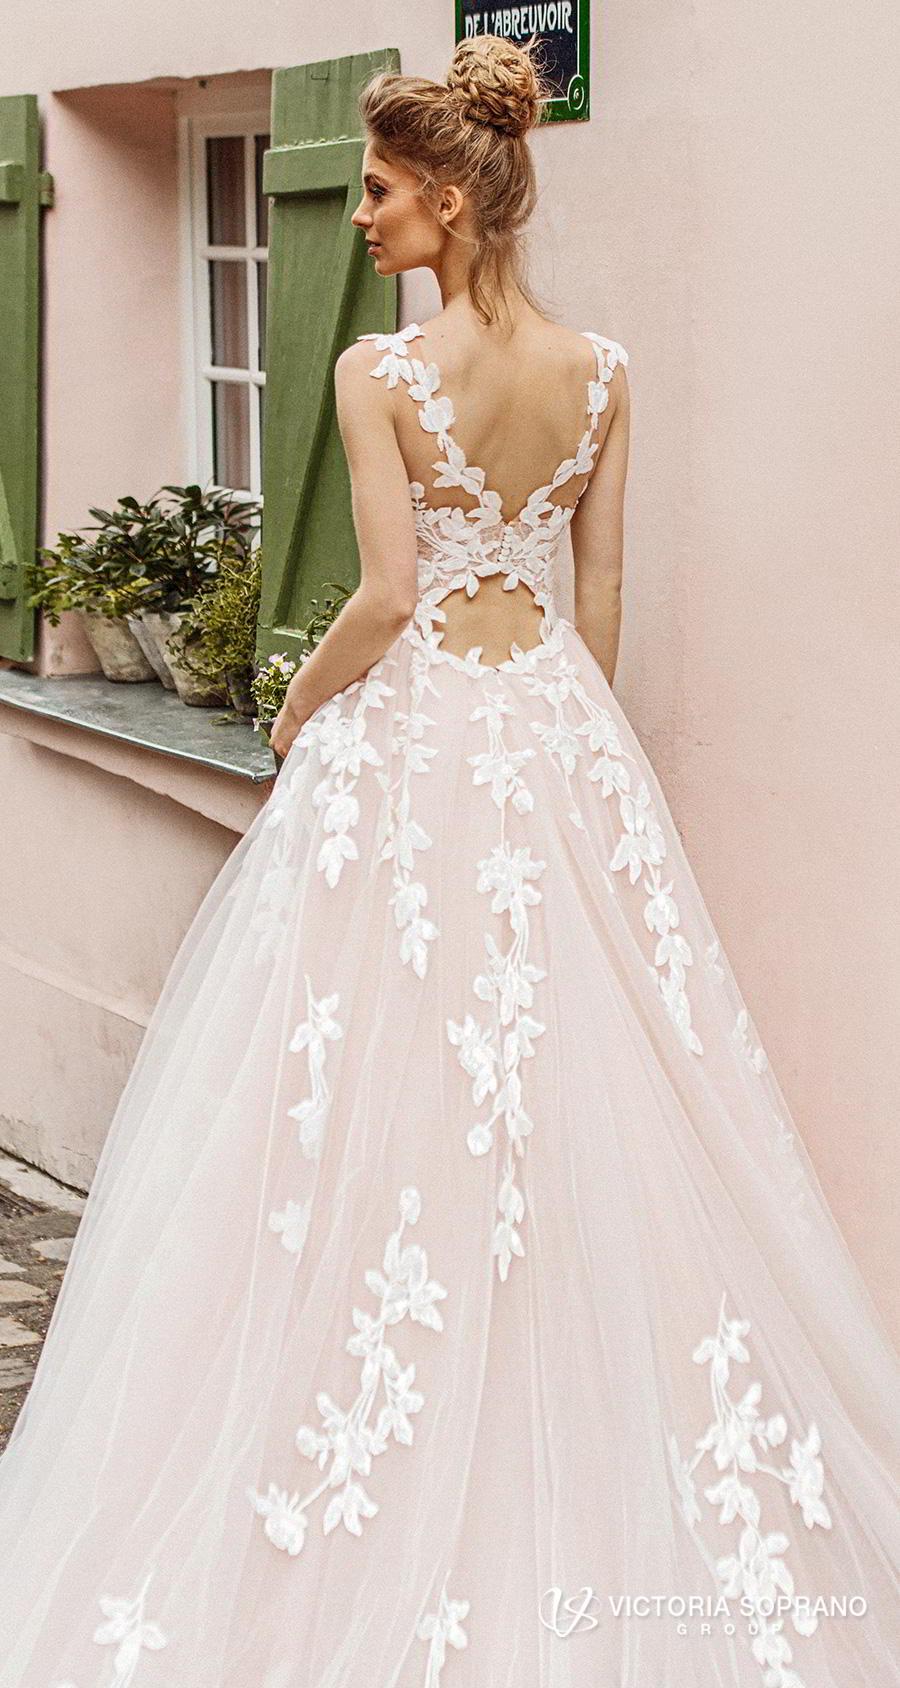 victoria soprano 2019 bridal sleeveless illusion bateau sweetheart neckline heavily embellished bodice romantic blush a  line wedding dress v back chapel train (bloom) zbv